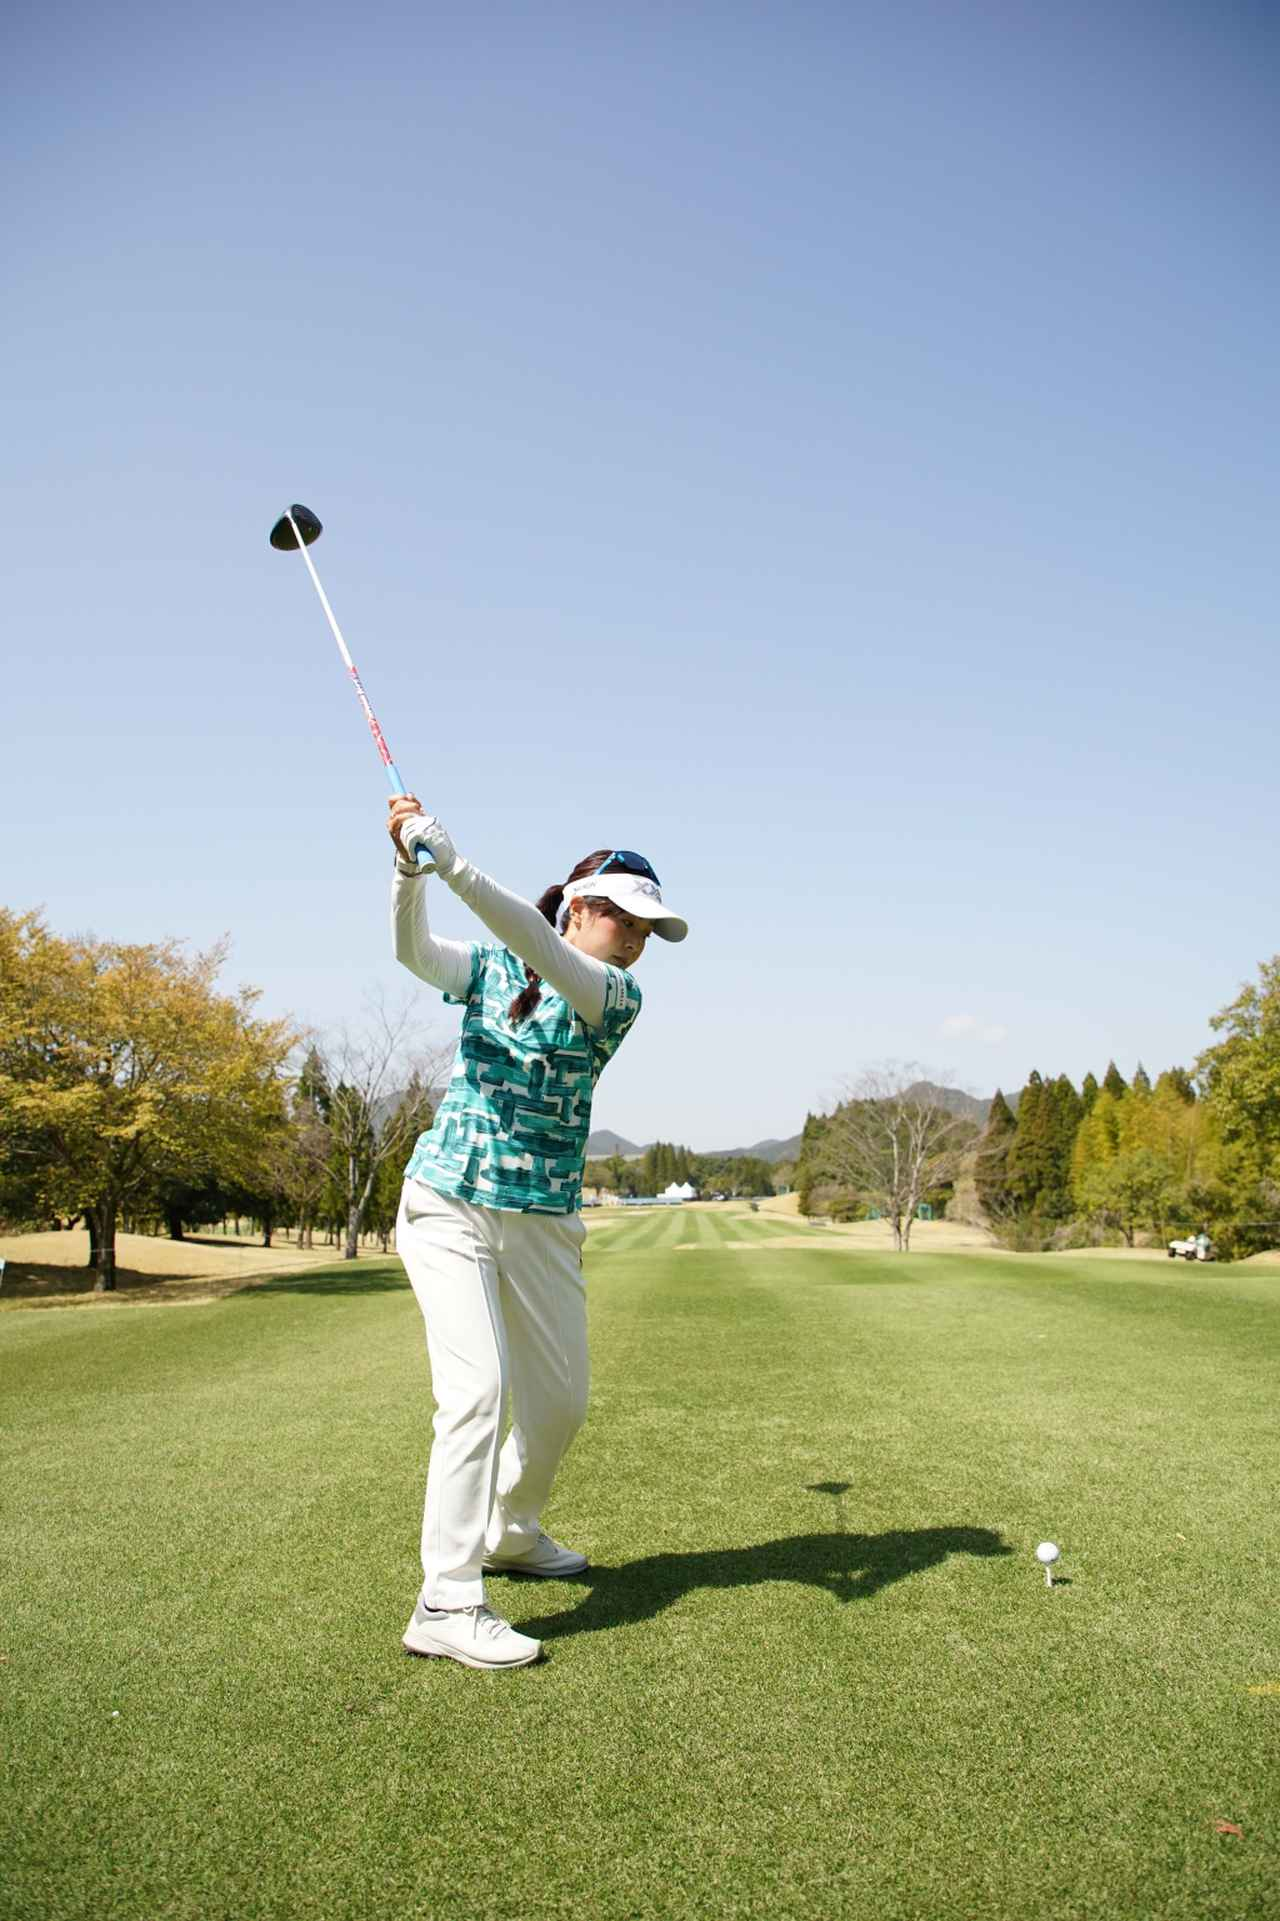 Images : 7番目の画像 - 青木瀬令奈のドライバー連続写真(後方) - みんなのゴルフダイジェスト